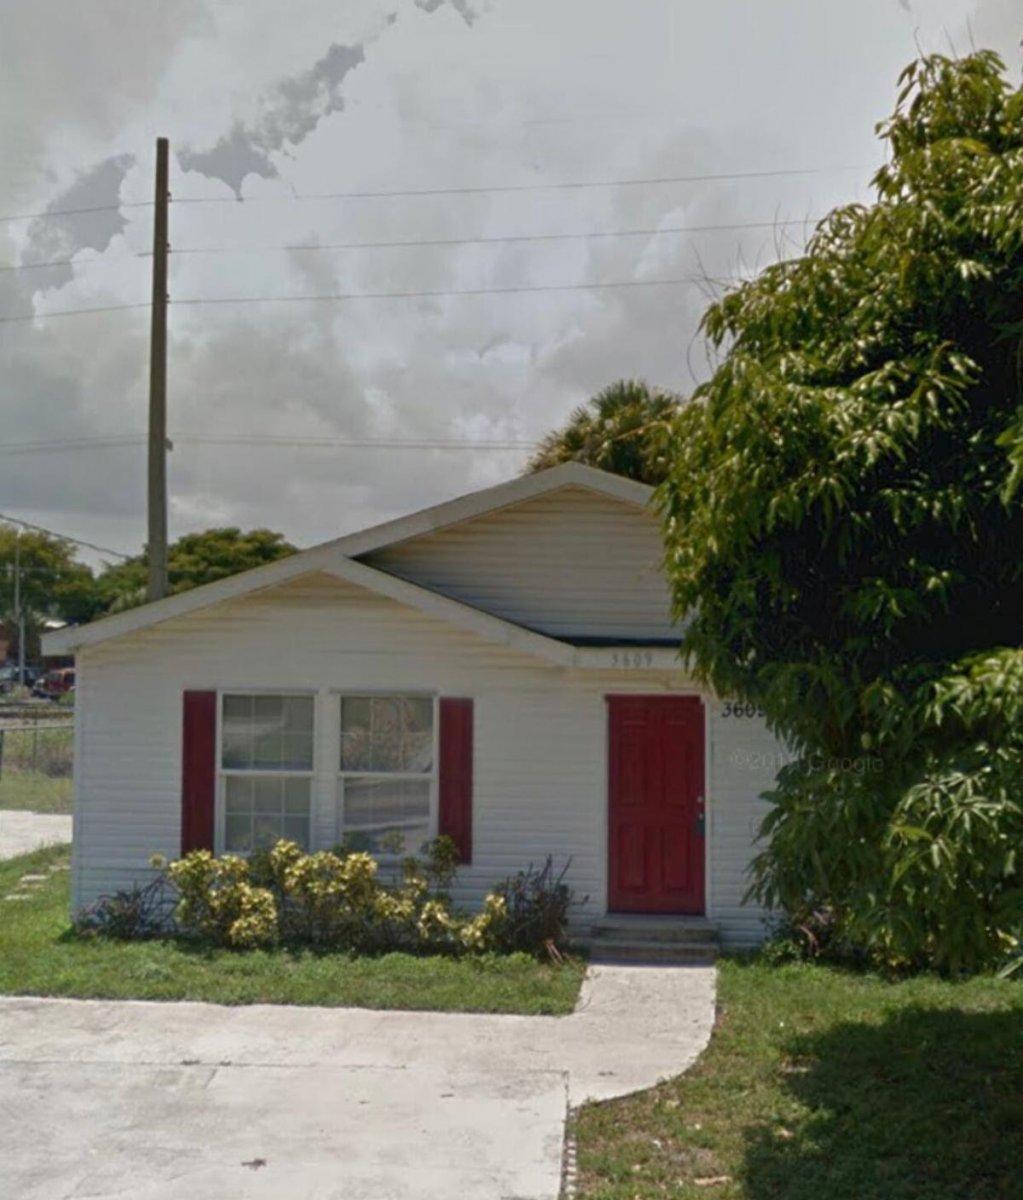 3609 Windsor AveWest Palm Beach, FL 33407, USA